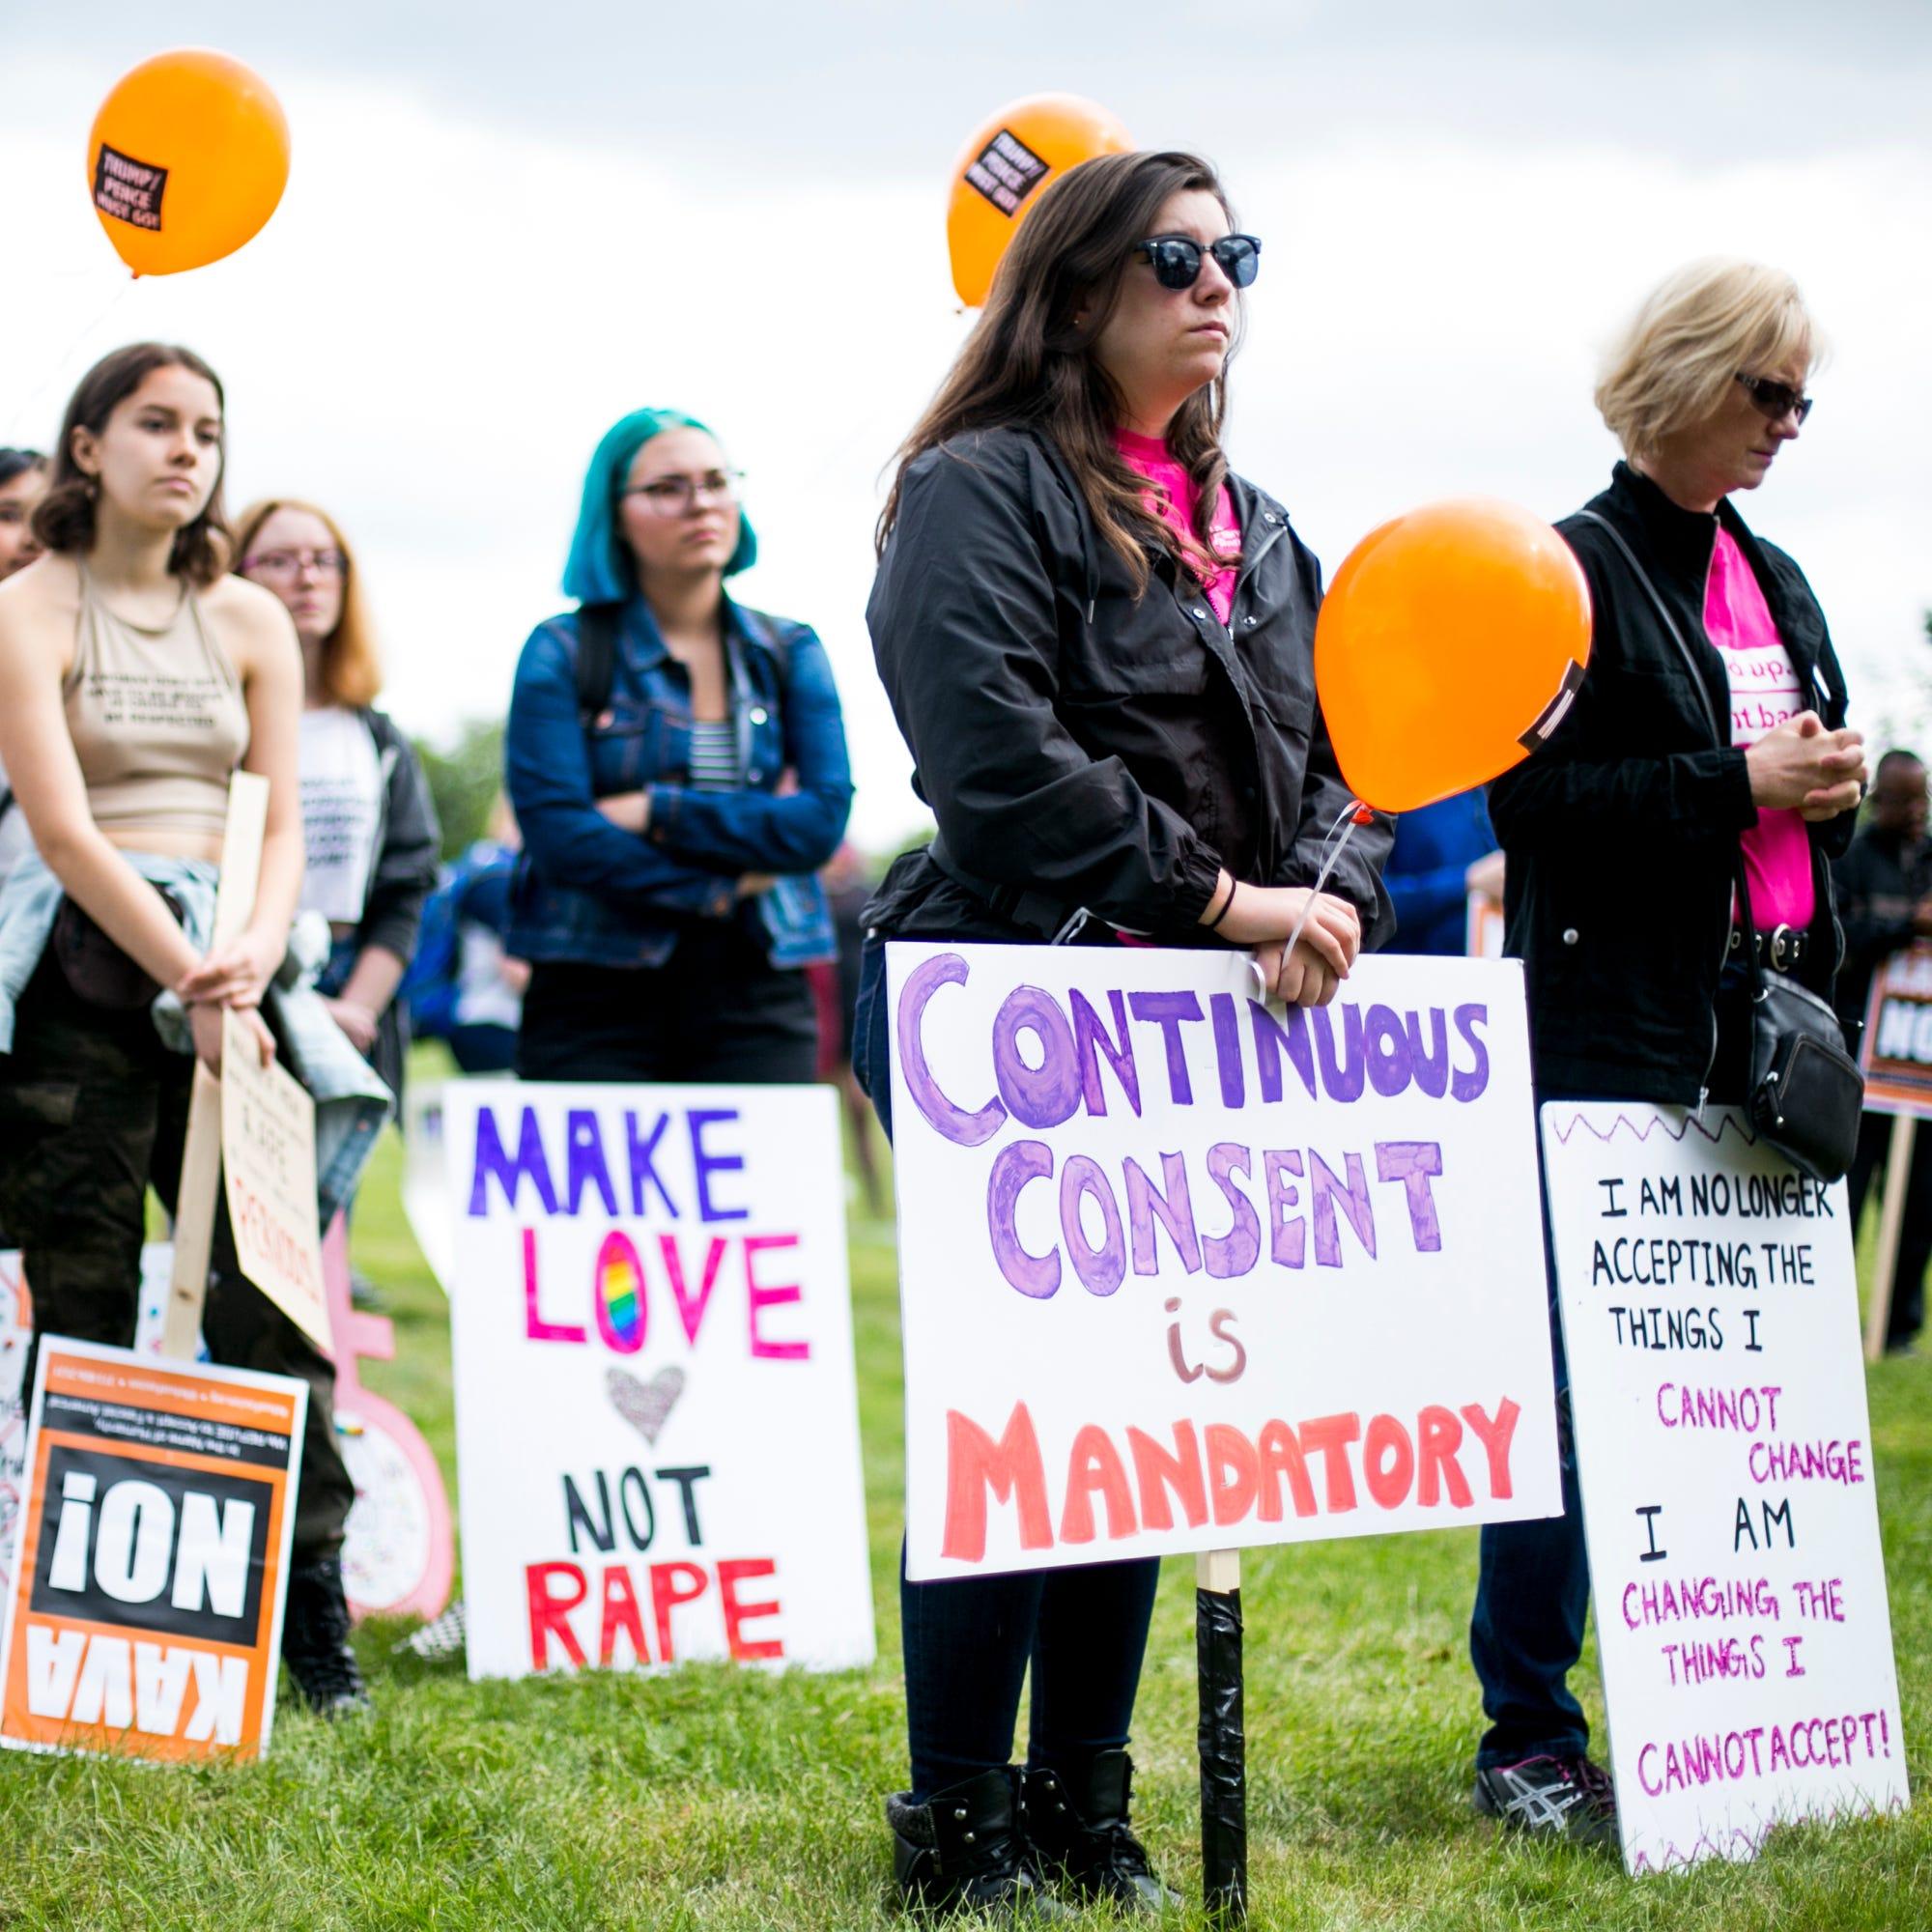 Women March for Consent at Detroit SlutWalk